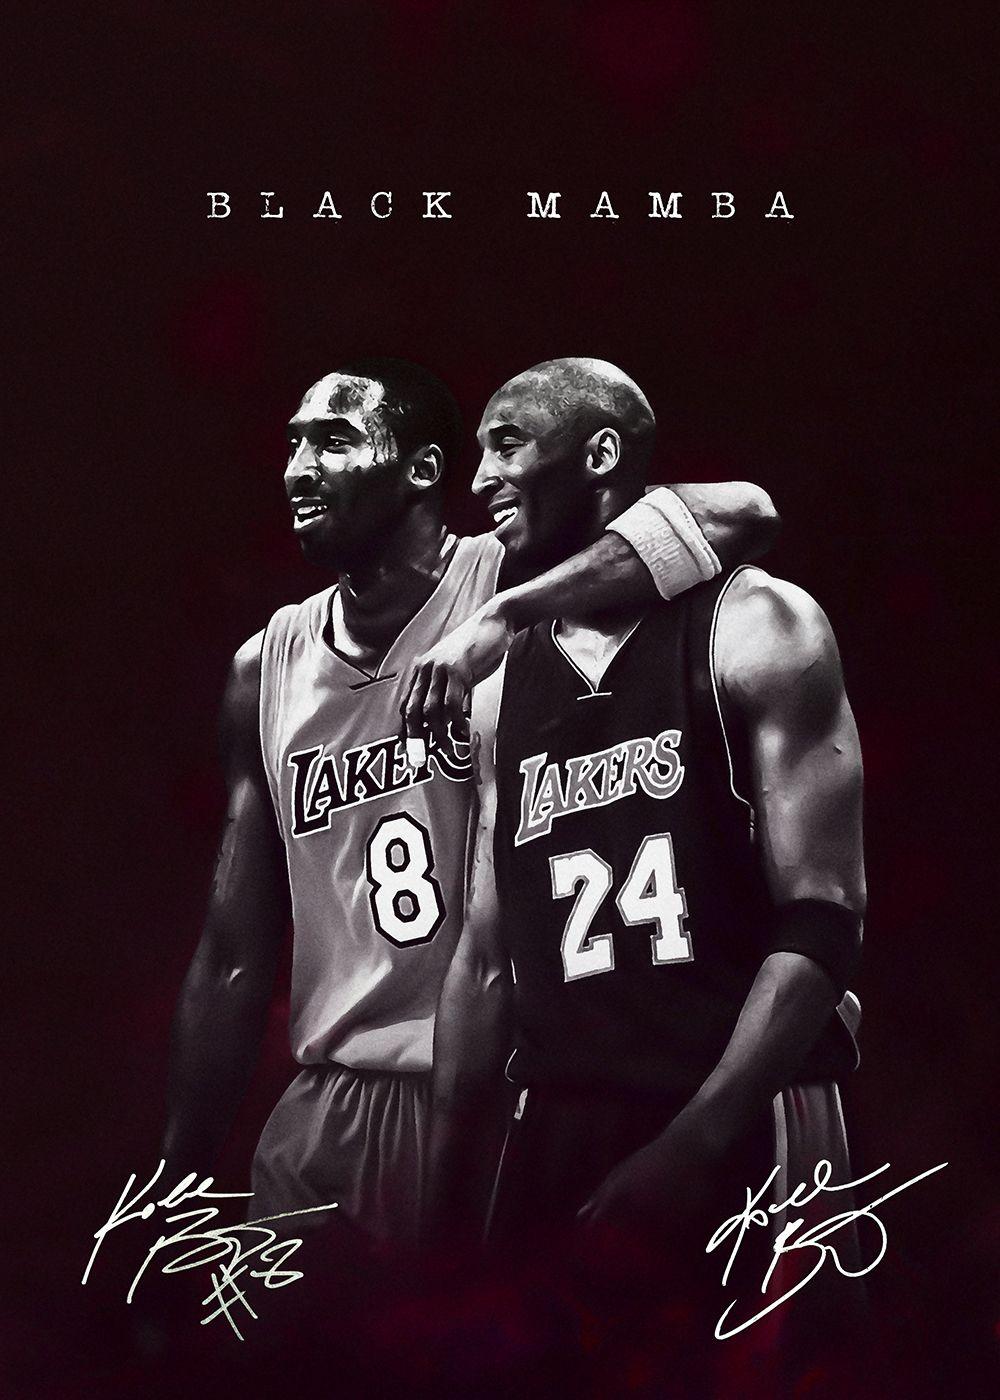 Nba Basketball Kobe Bryant Black Mamba Kobe Bryant Pictures Kobe Bryant Kobe Black mamba basketball black mamba kobe